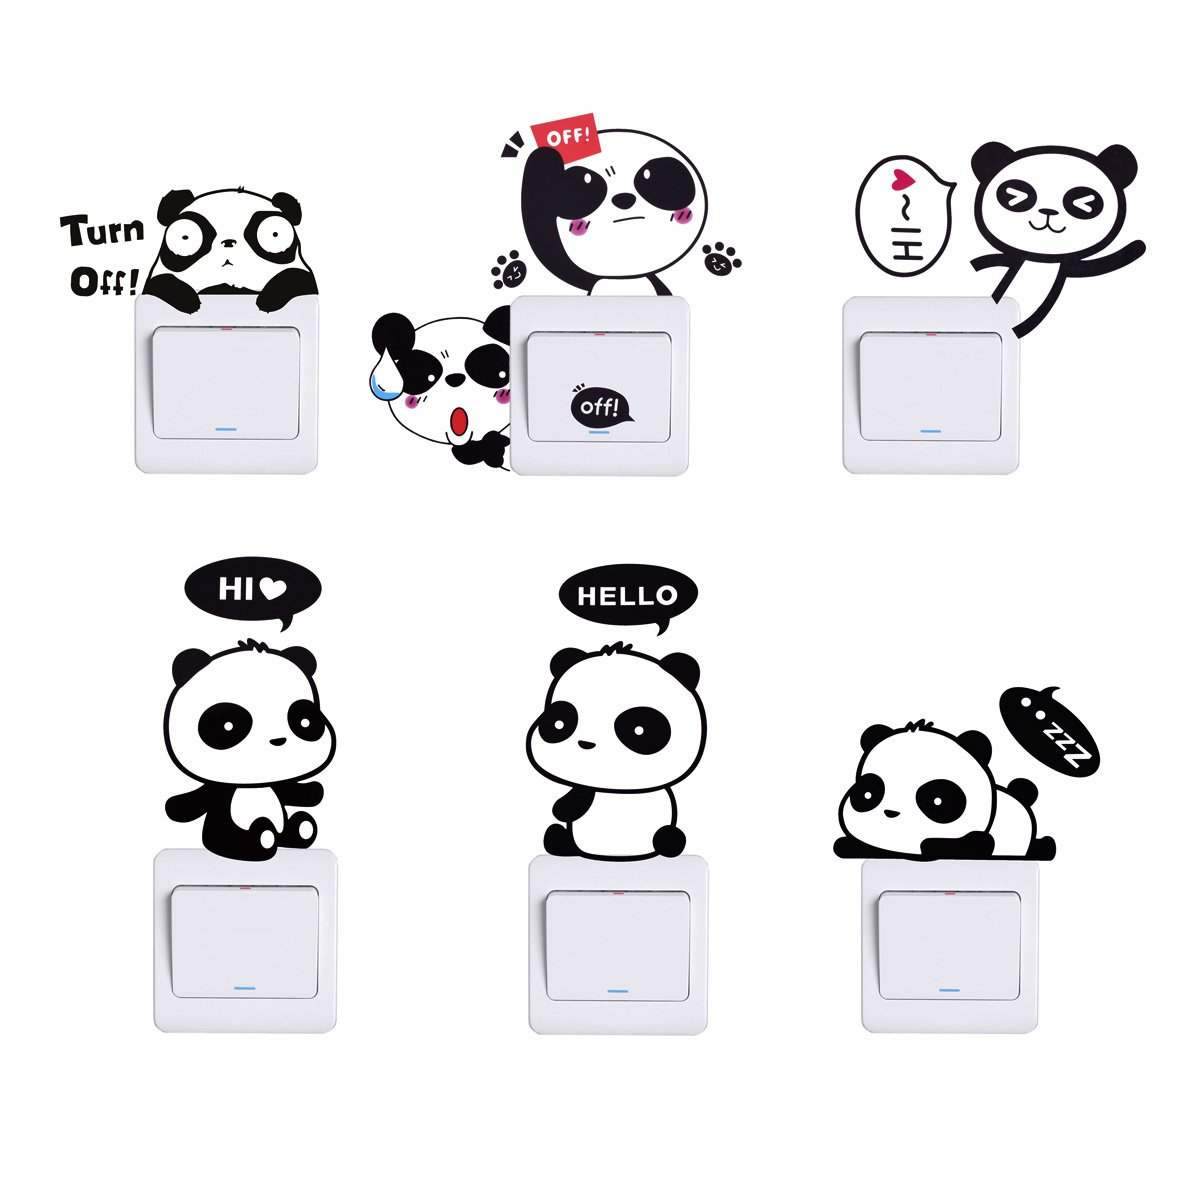 HopMore Pegatinas 6 Piezas Lindo Panda, Stickers para Infantil, Decorativa Pegatina para Pared Maleta Interruptor Macbook Laptop Snowboard Equipaje Coche de la bici Tabla iPhone